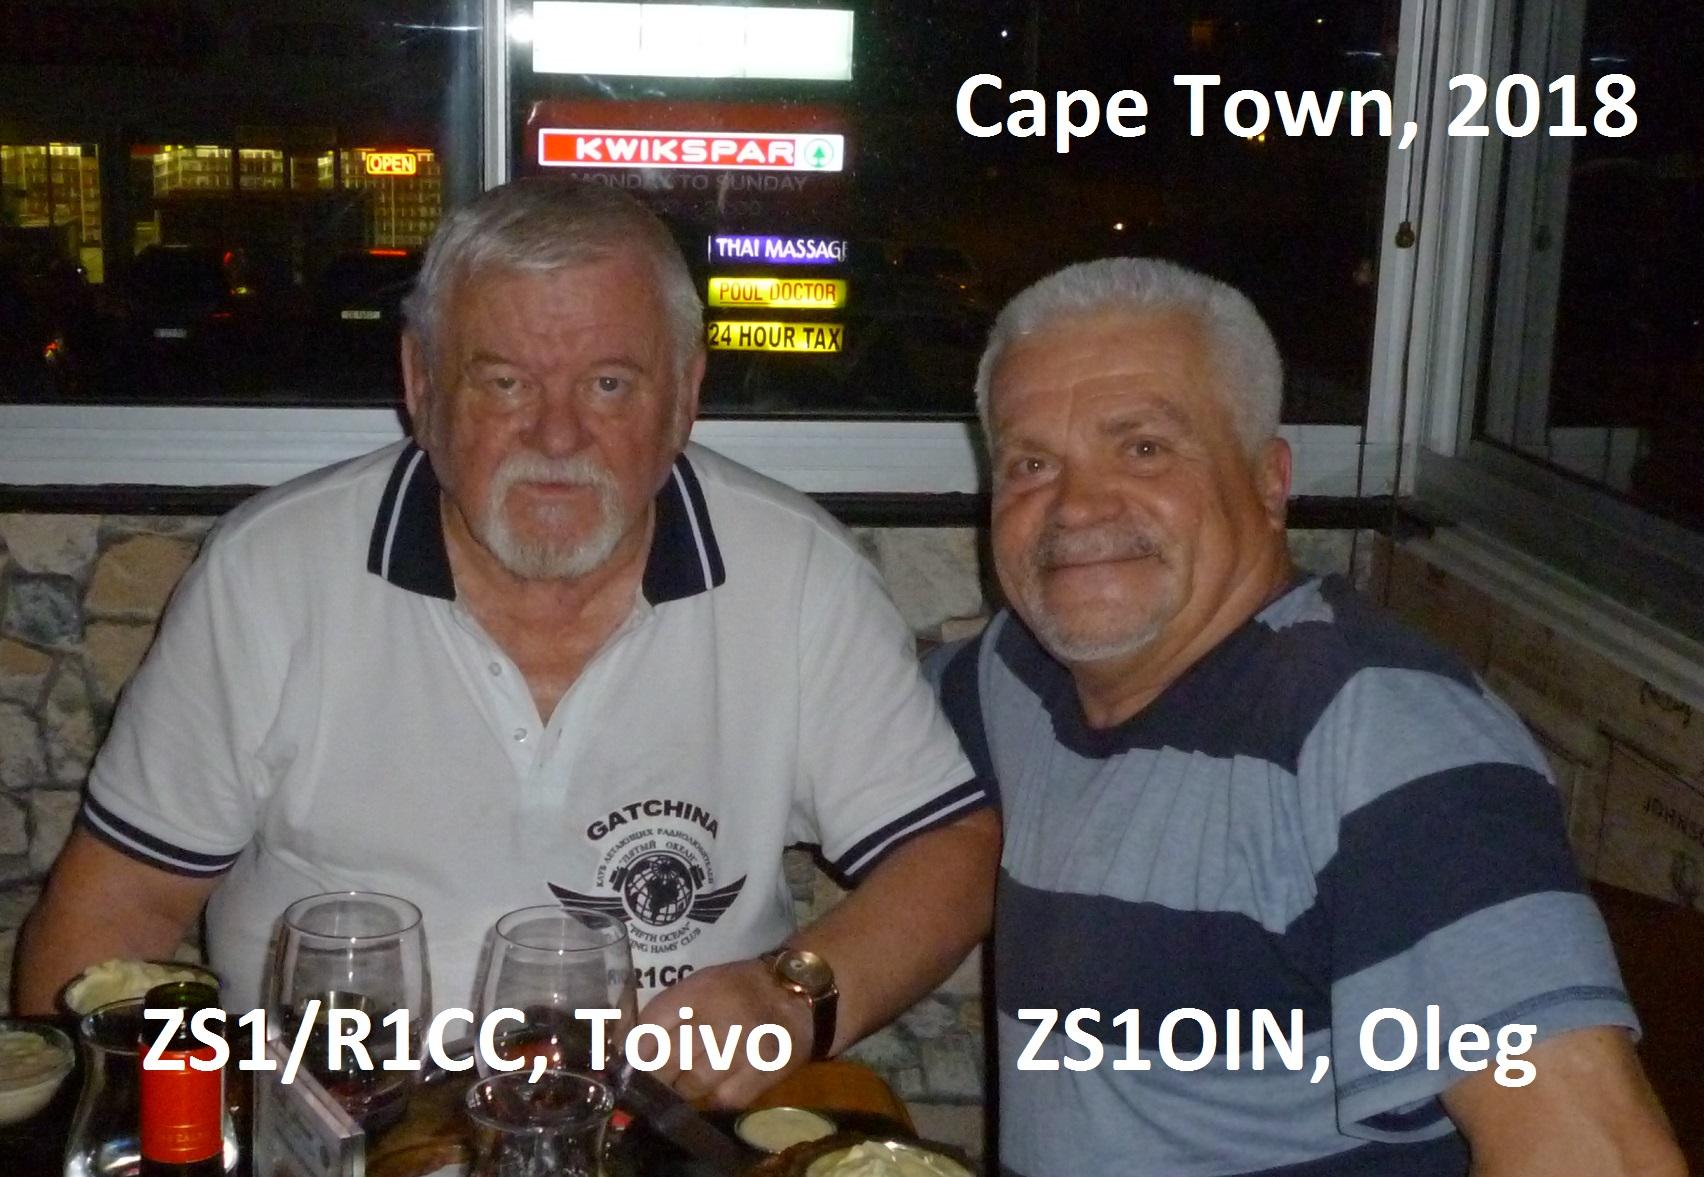 Нажмите на изображение для увеличения.  Название:R1CC-ZS1OIN-2018.JPG Просмотров:7 Размер:529.9 Кб ID:229488